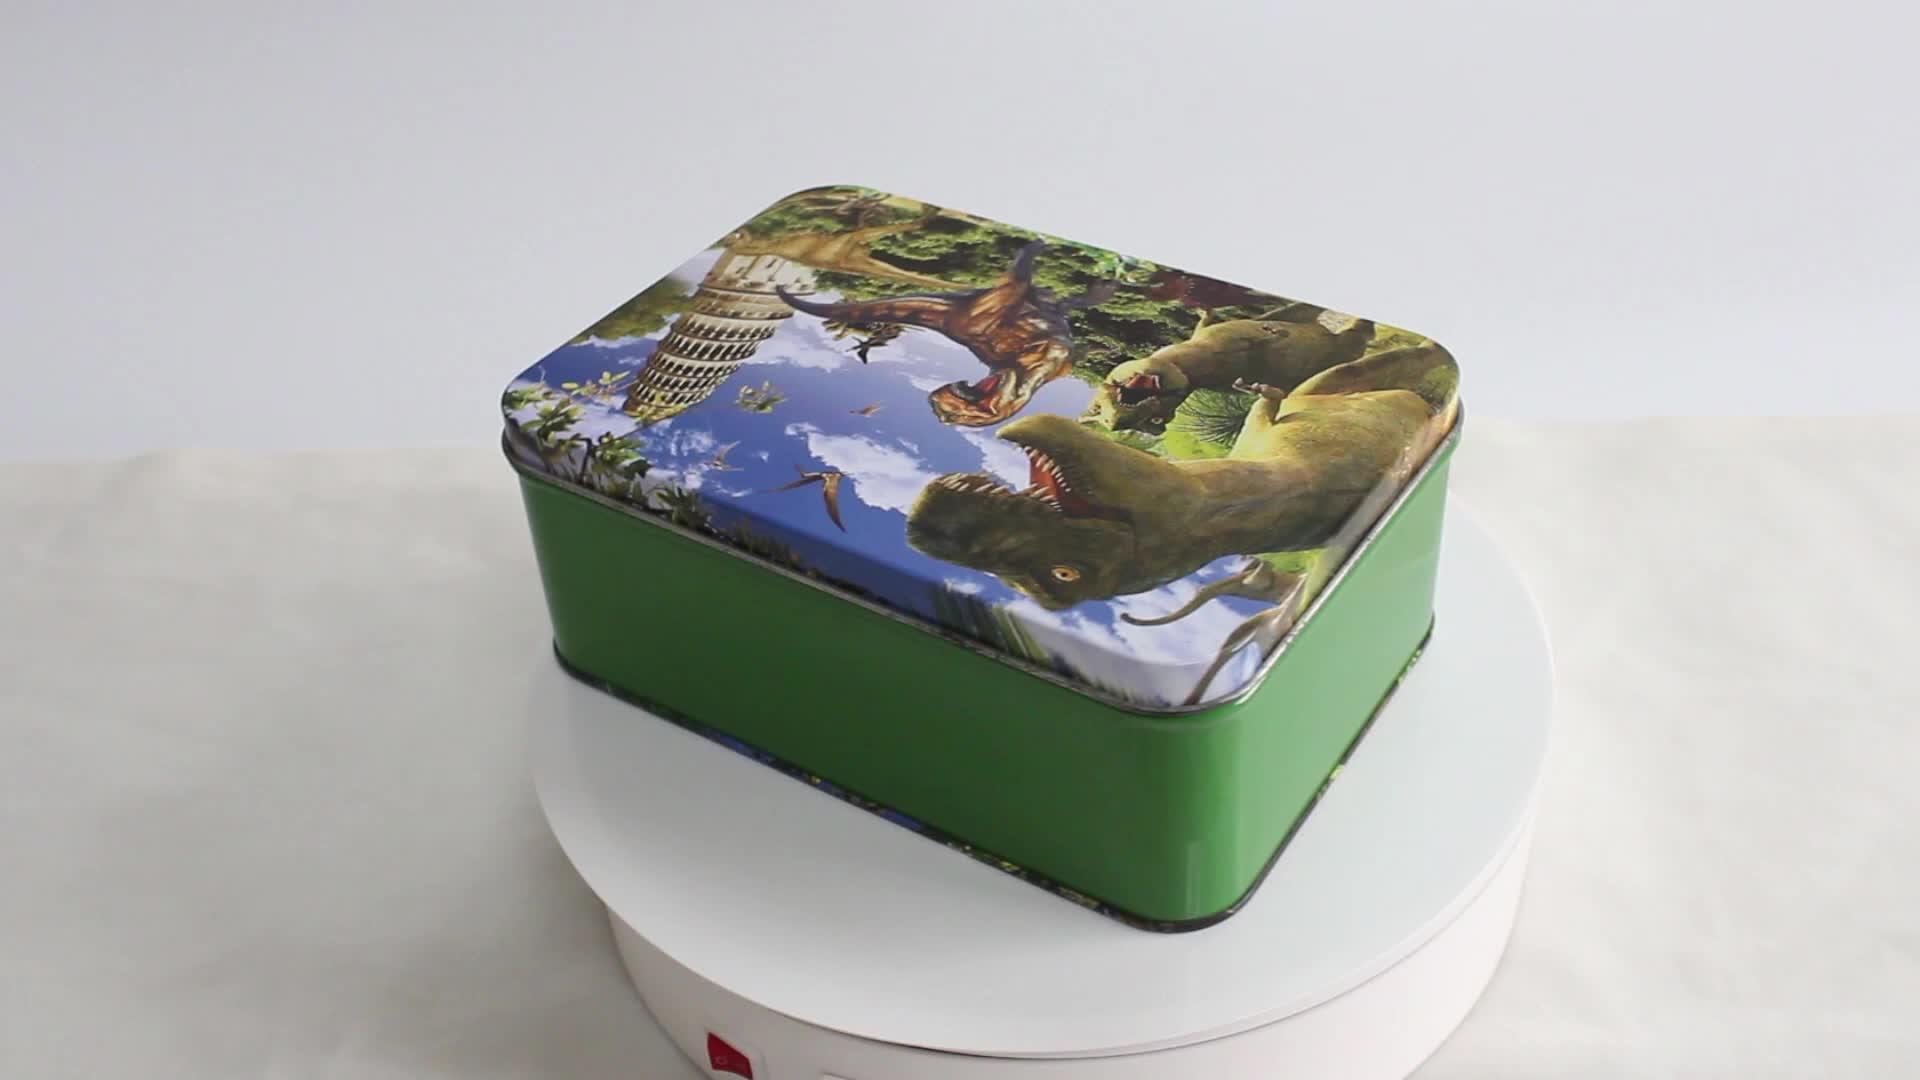 Hot Sale Vintage OEM/ODM Lunch Tin Box